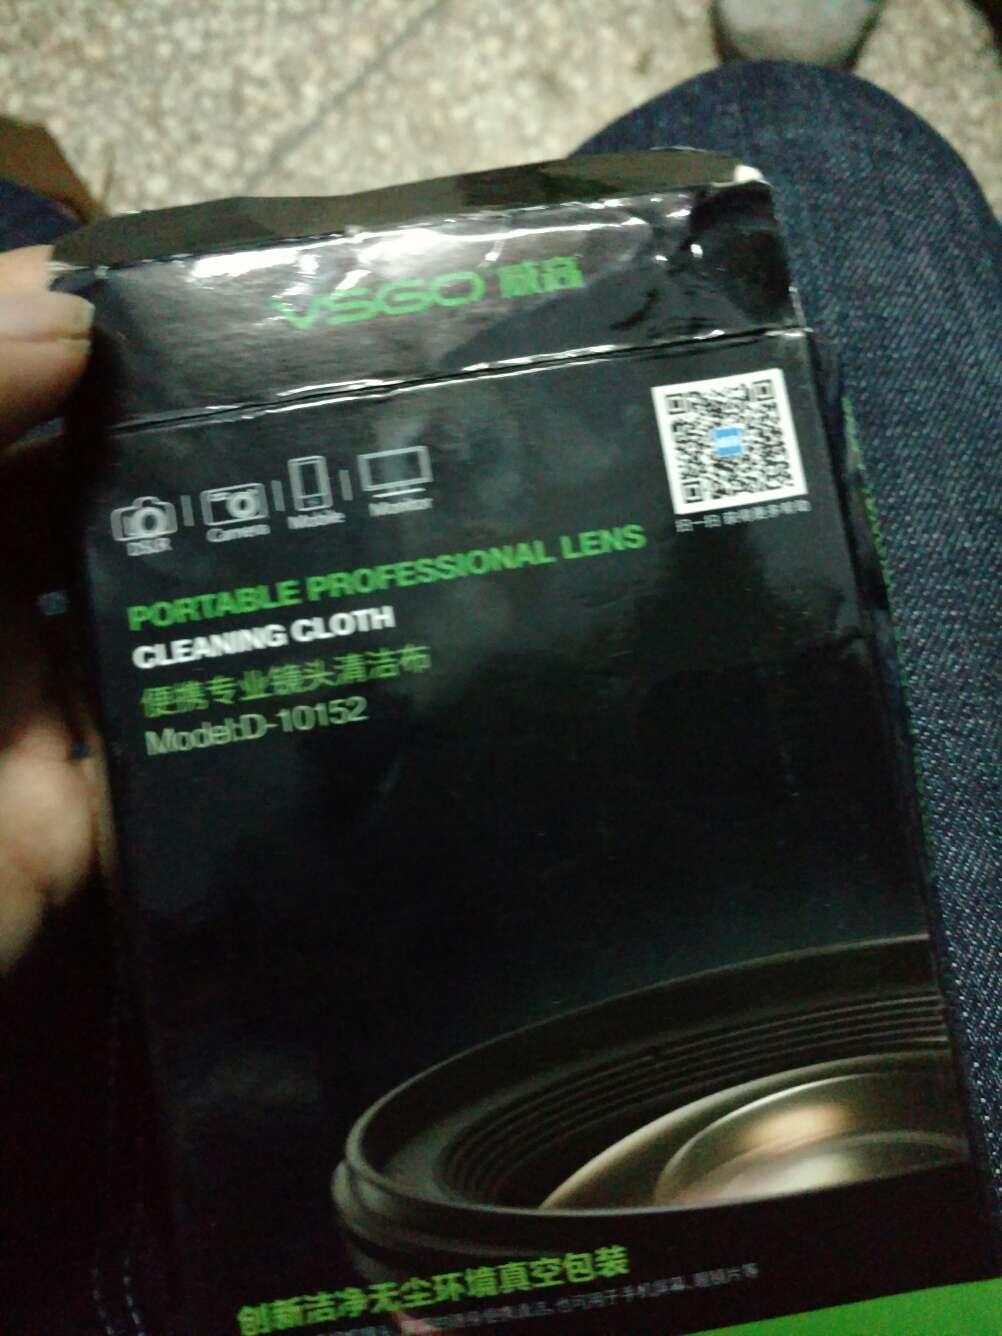 jordans 6 infrared foot locker 00297575 bags